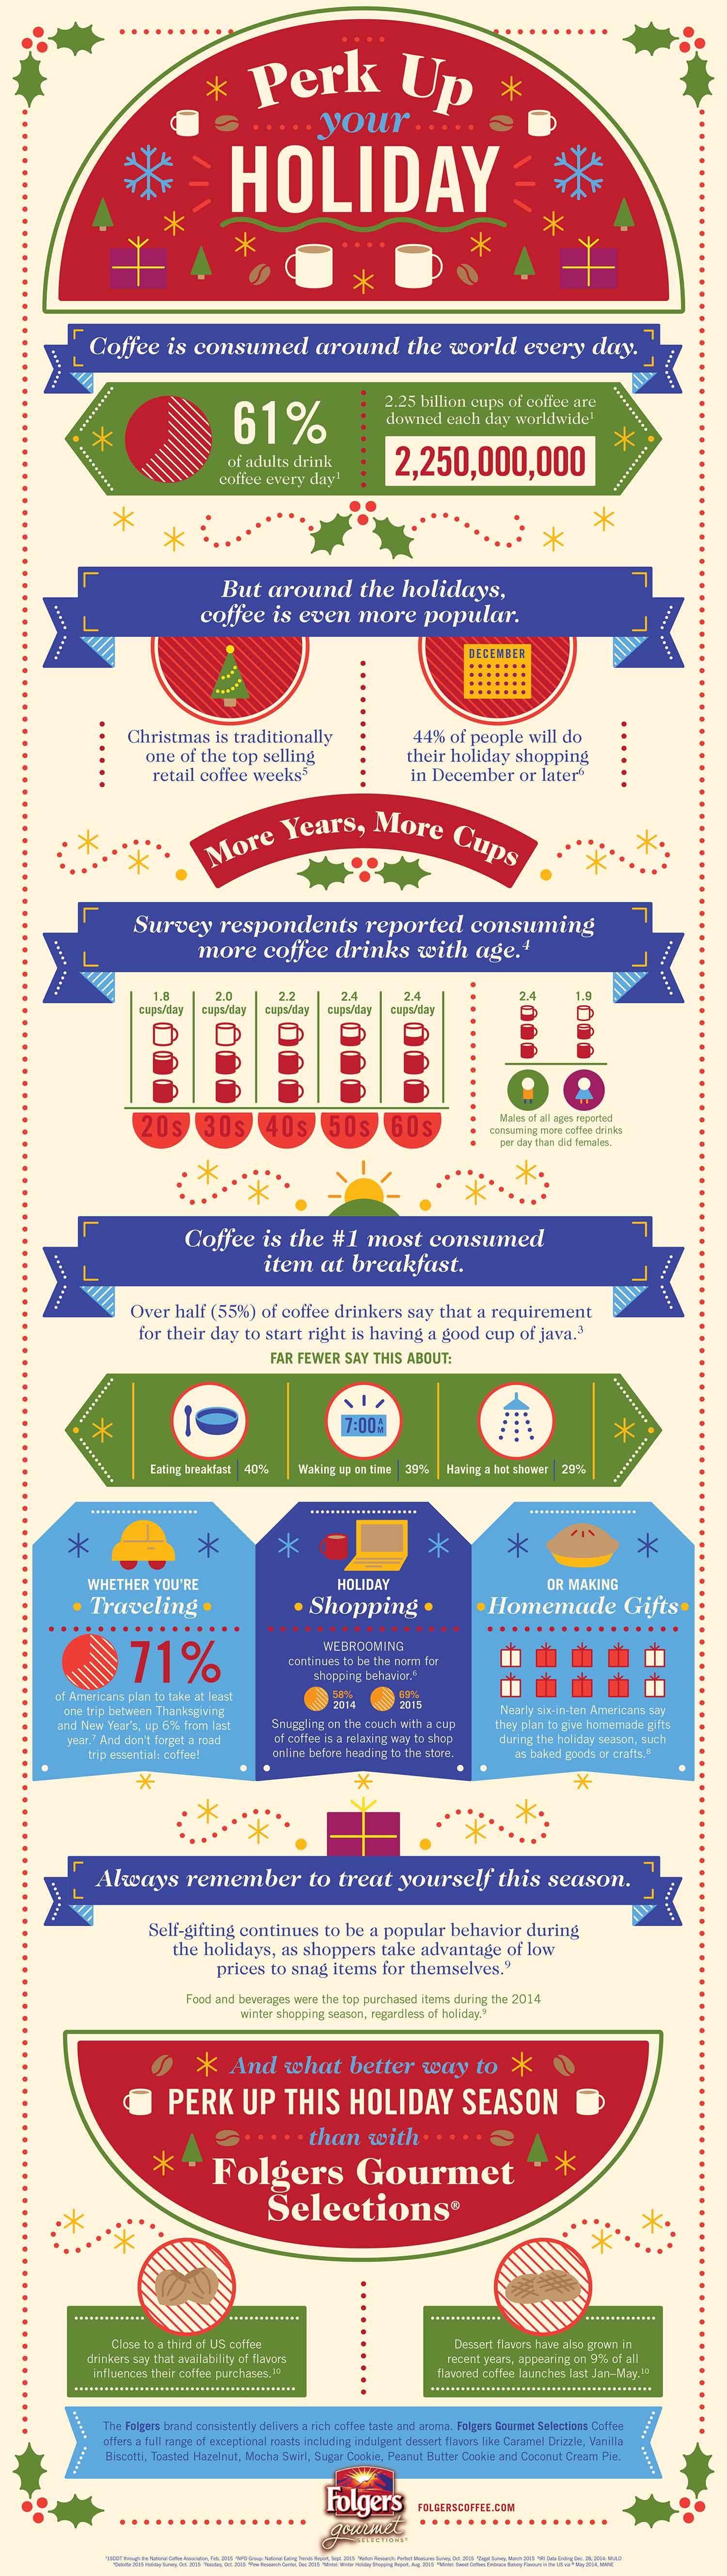 infographic6_anneulku.jpg